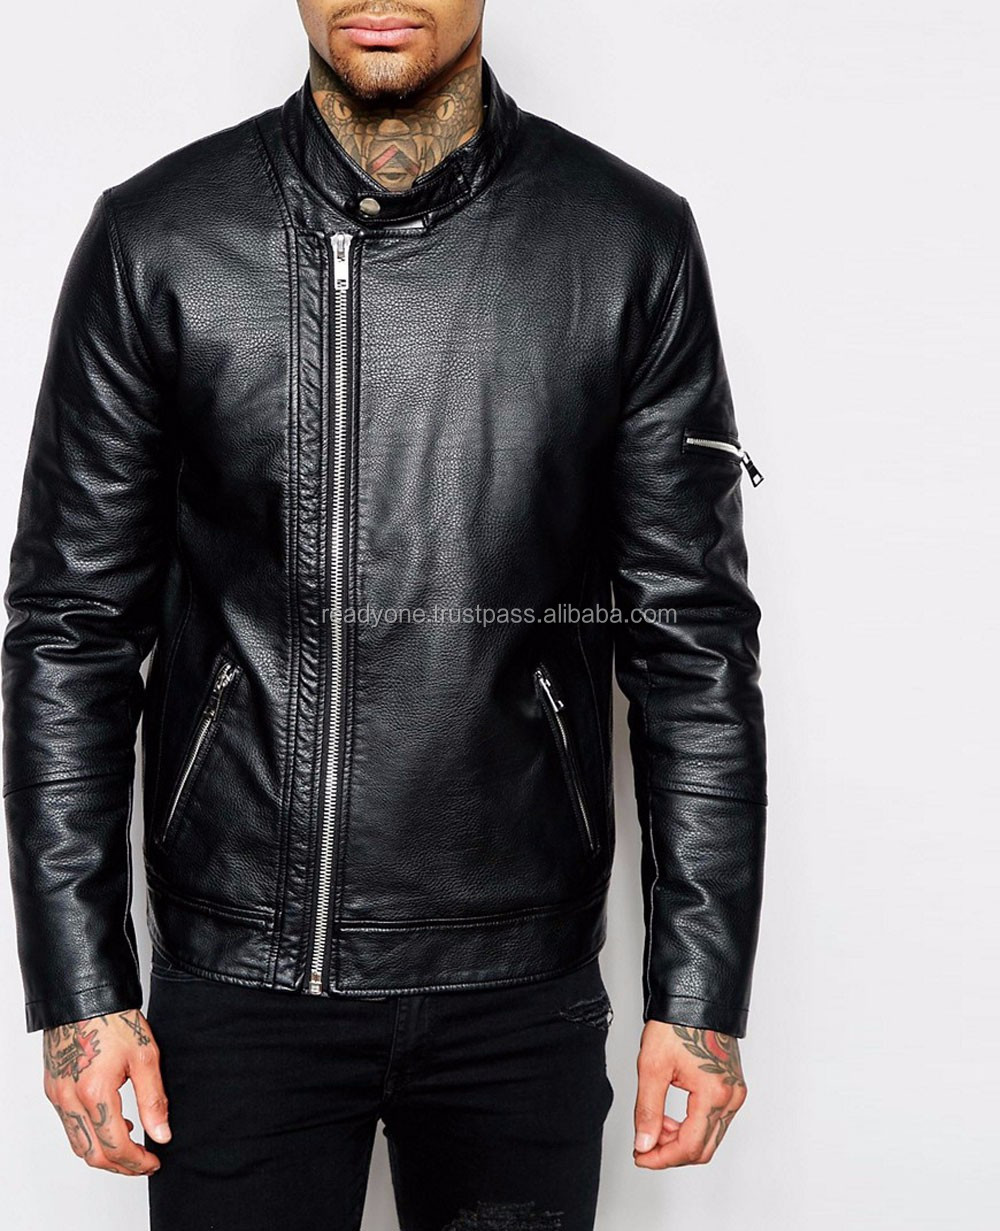 Leather jacket karachi - Fashion Black Mens Hooded Pakistan Leather Jackets For Men Karachi